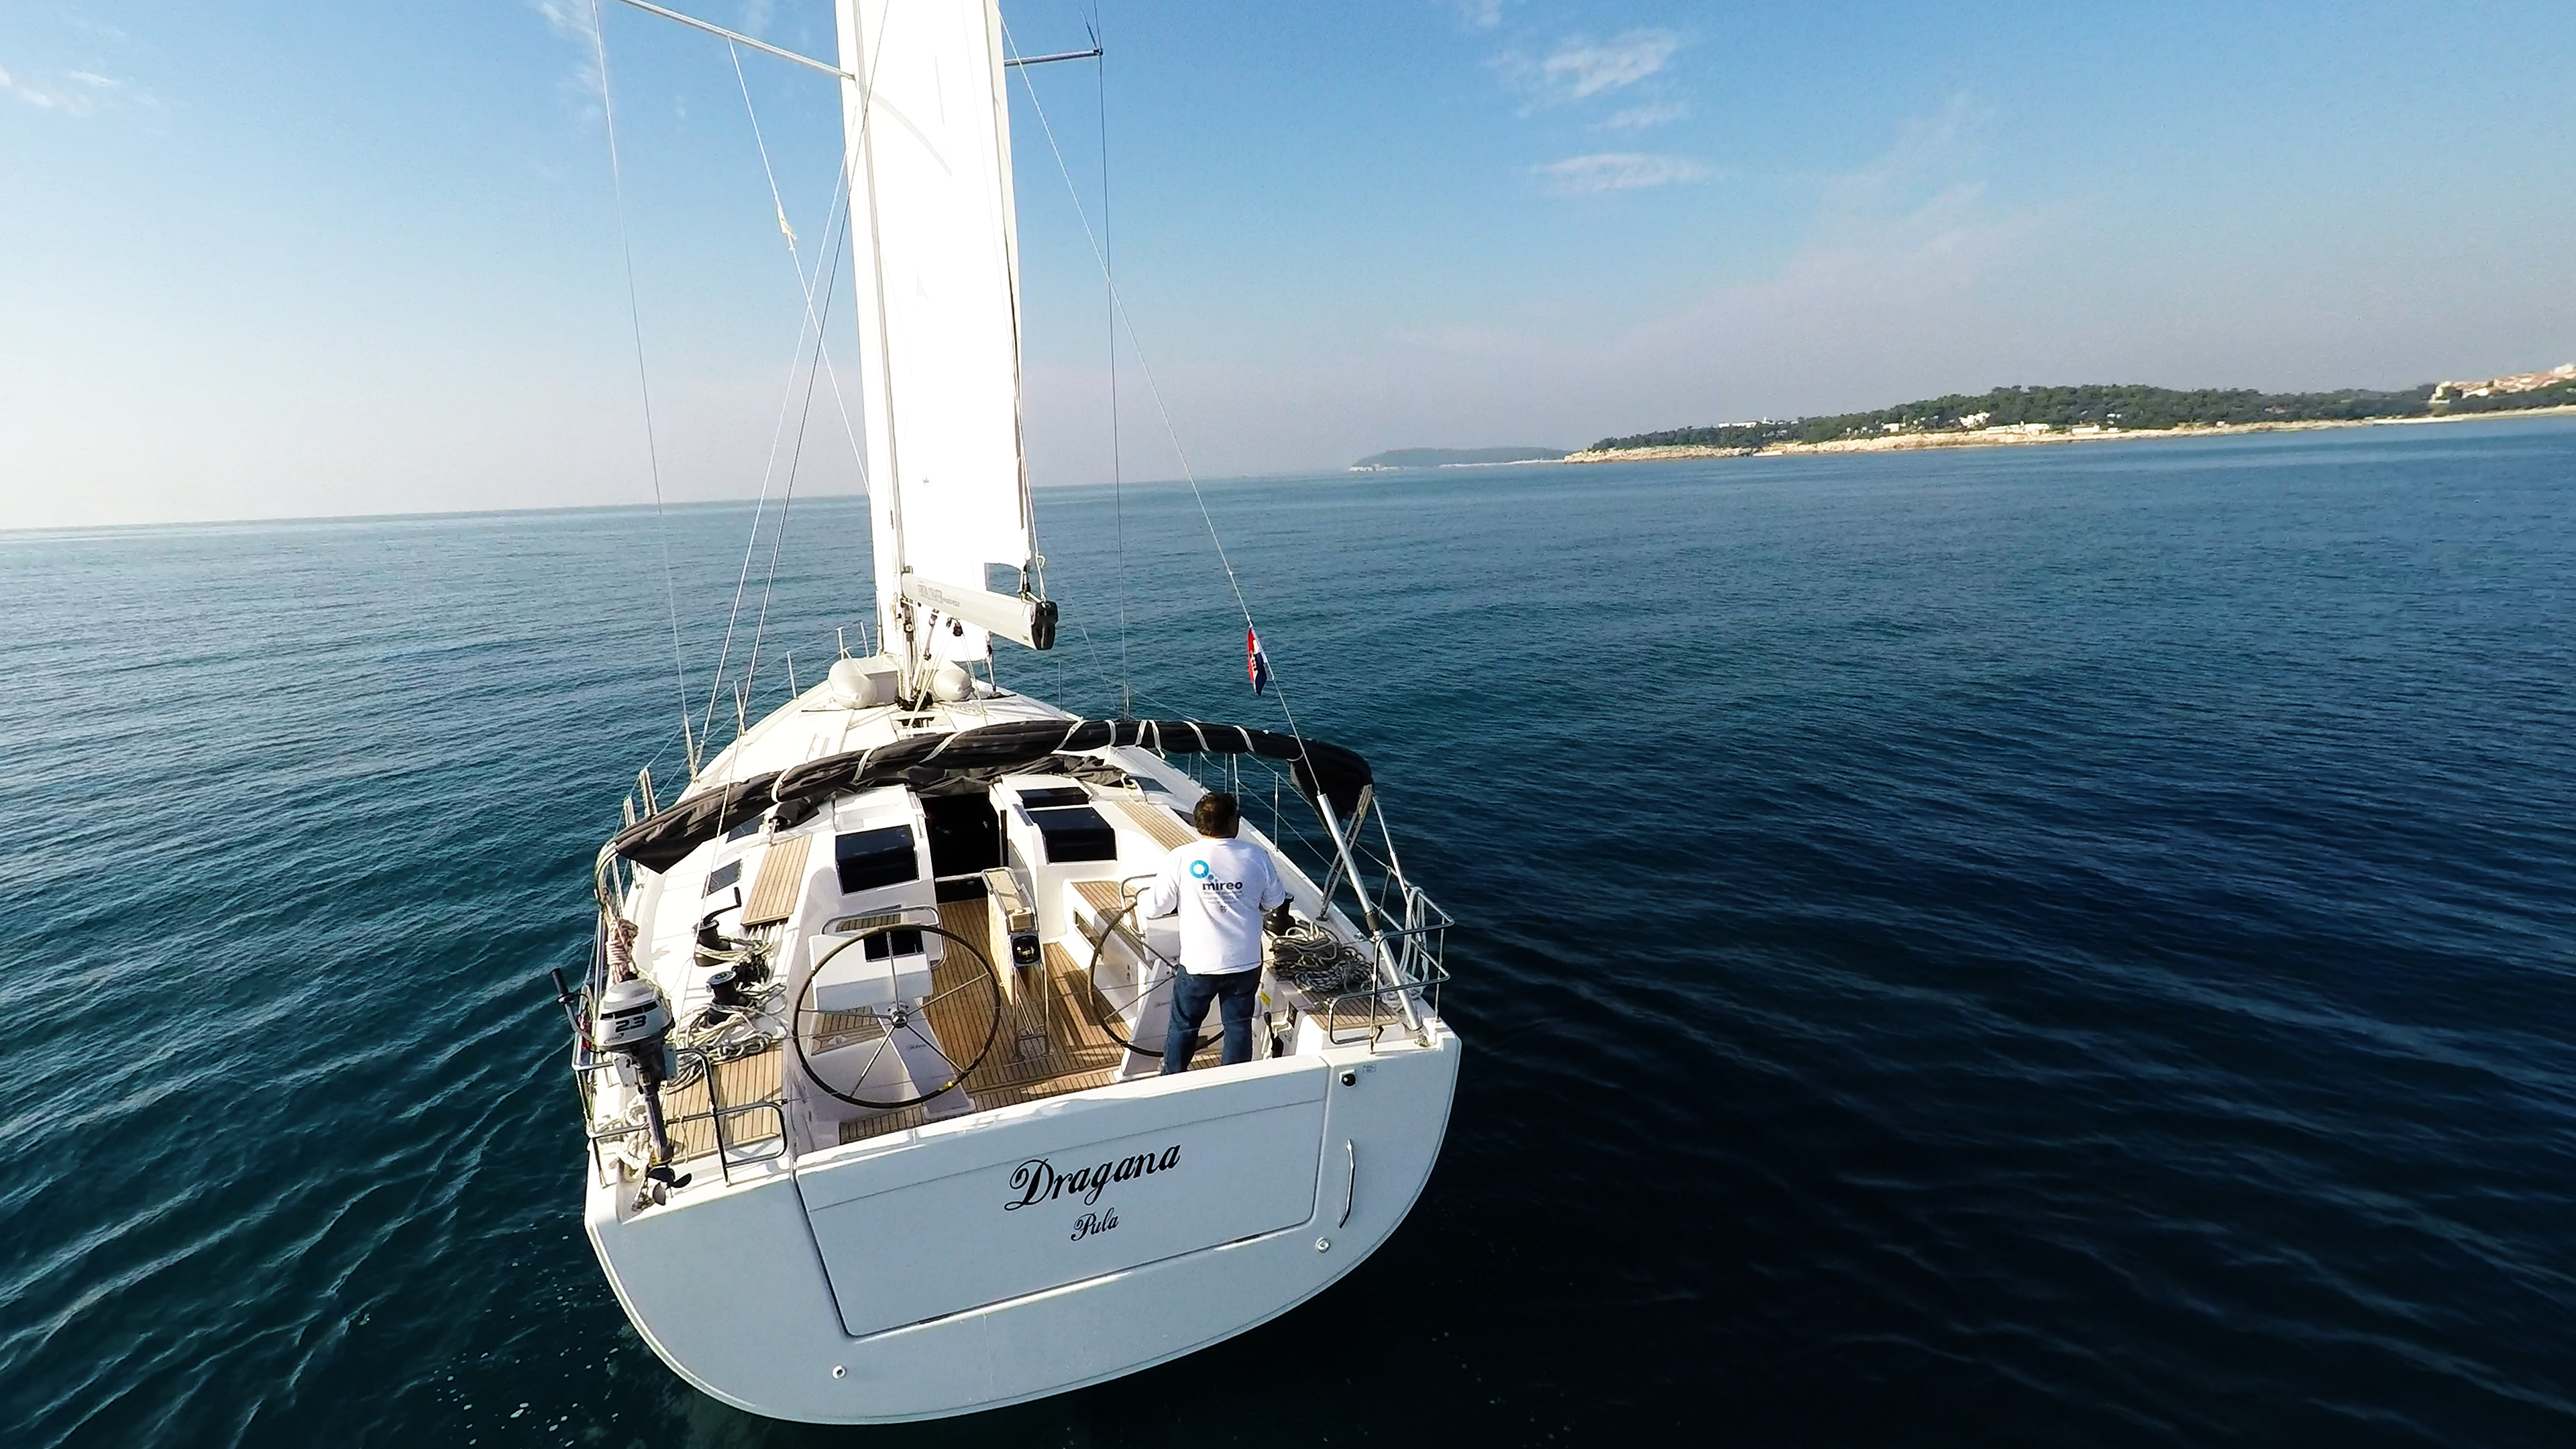 sailing yacht stern sailing yacht Hanse 505 boat sea